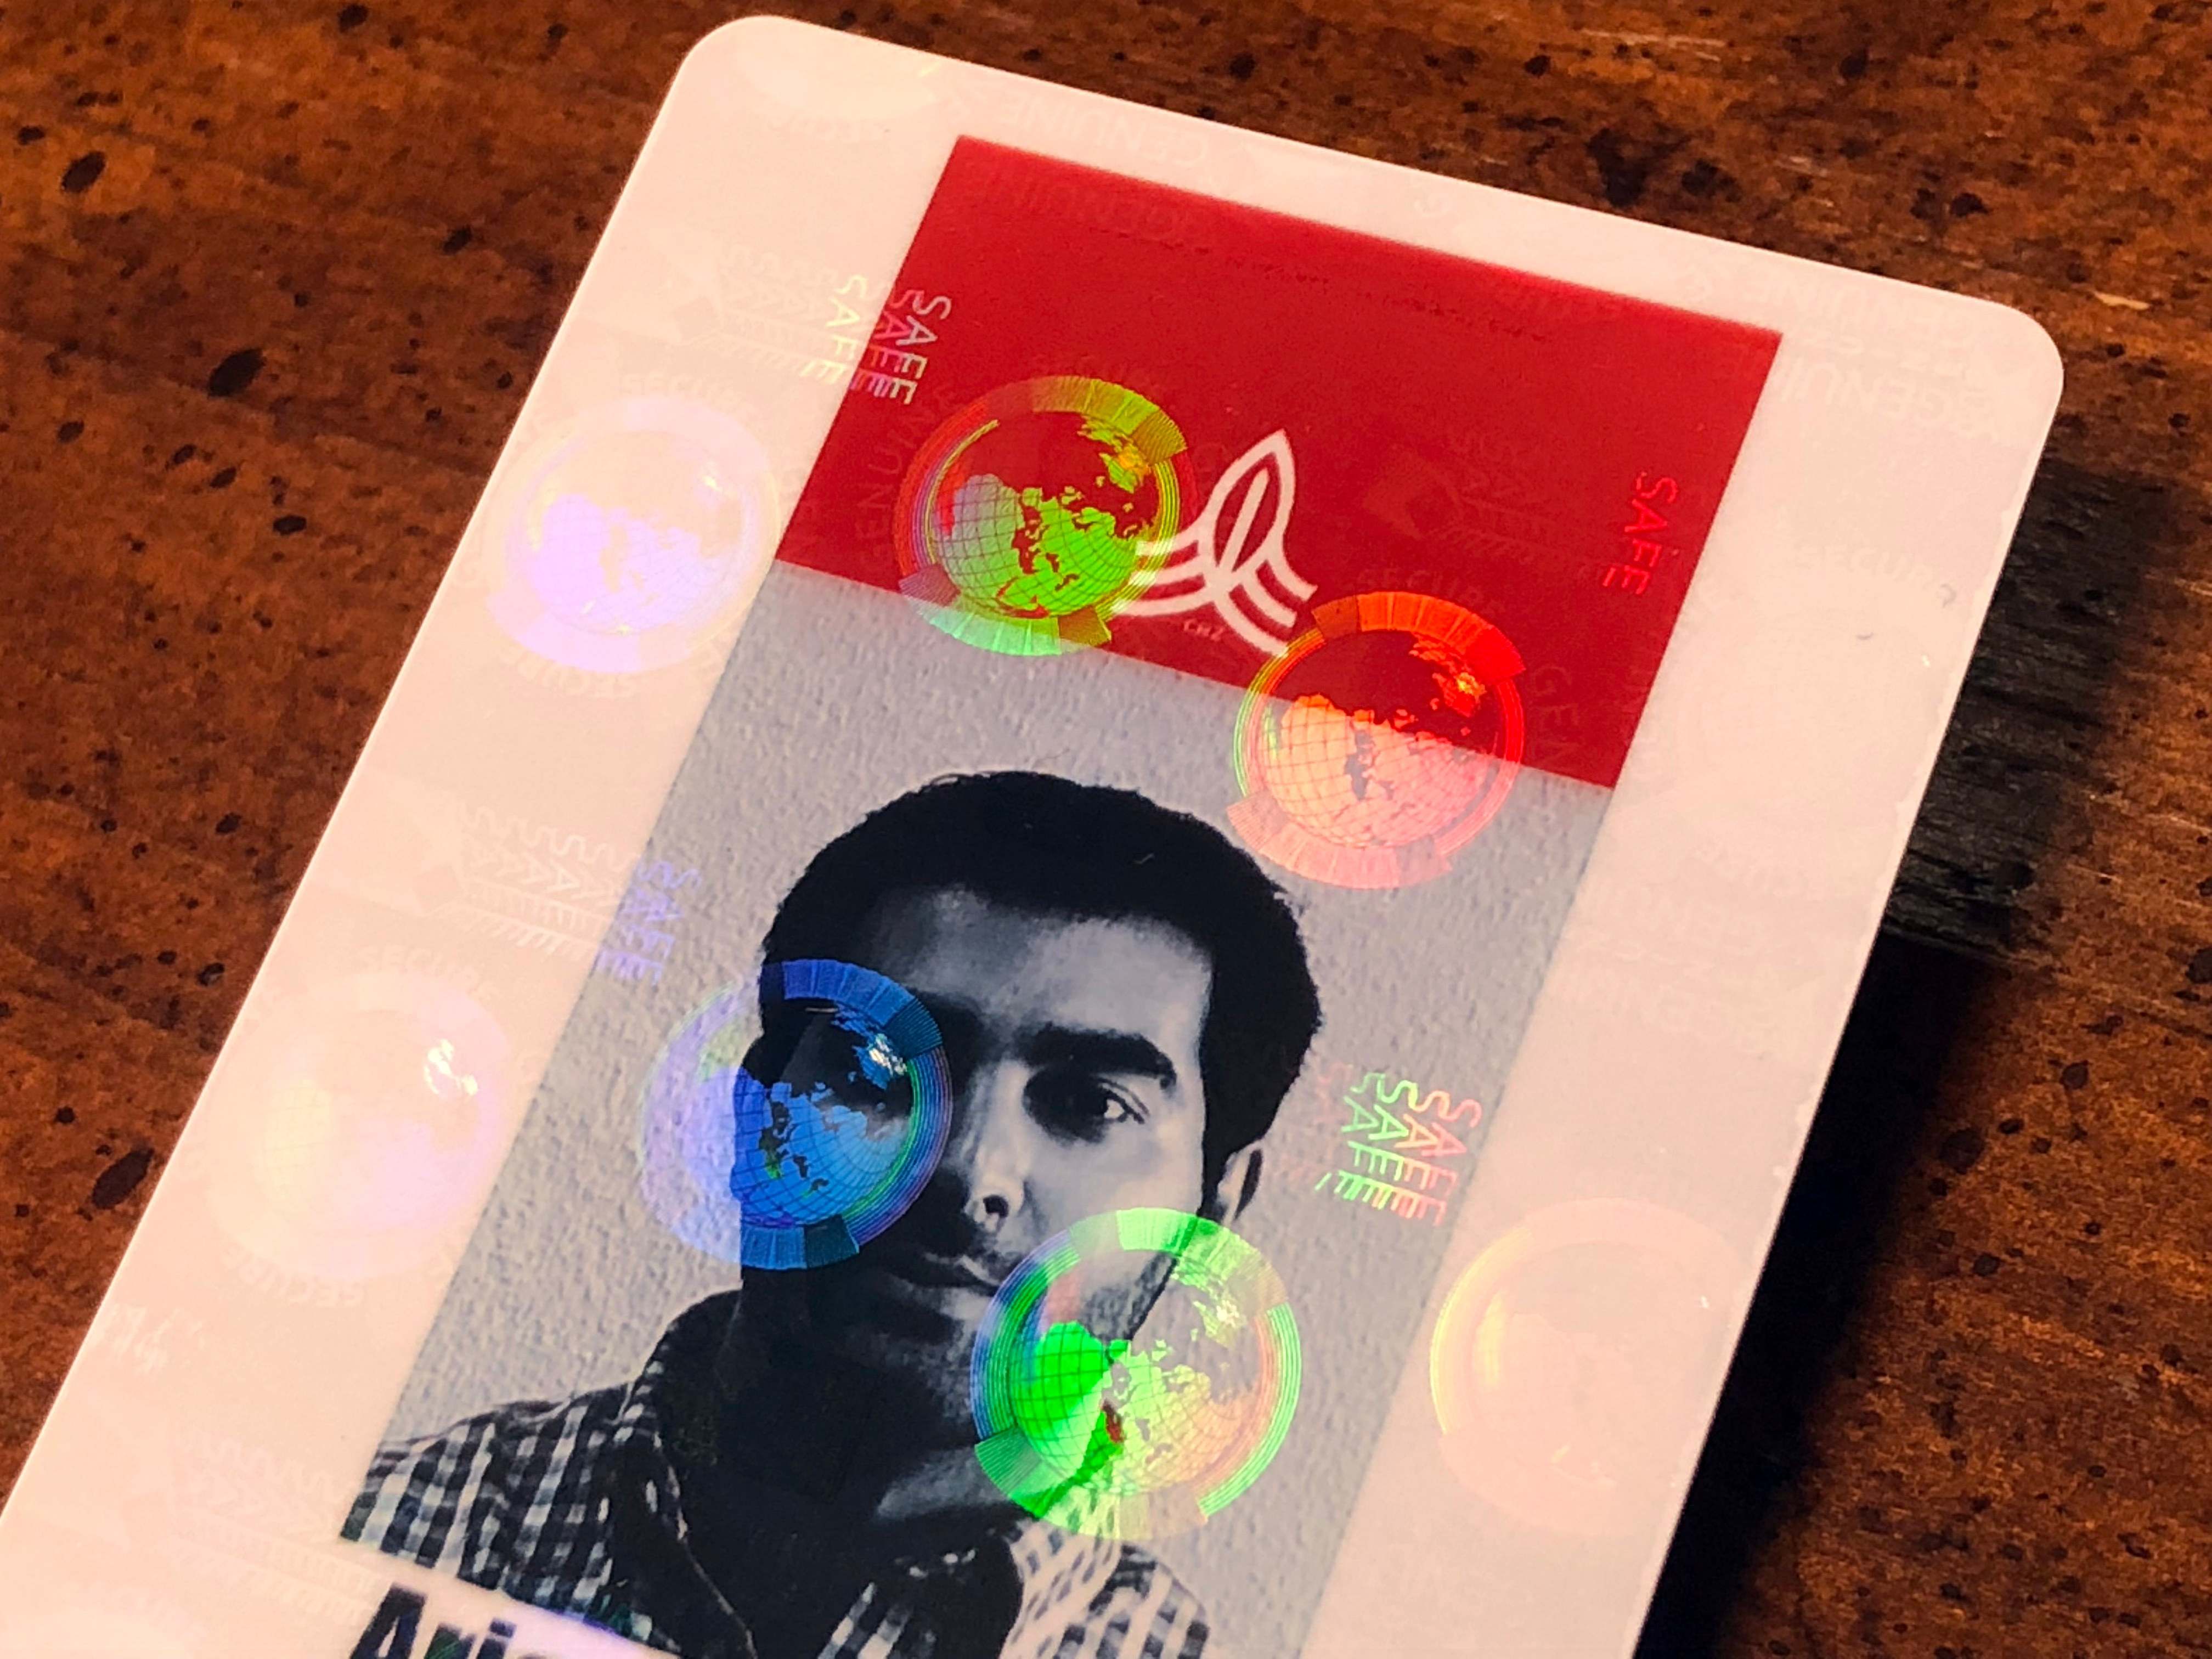 Custom ID Badge with a Hologram Finish